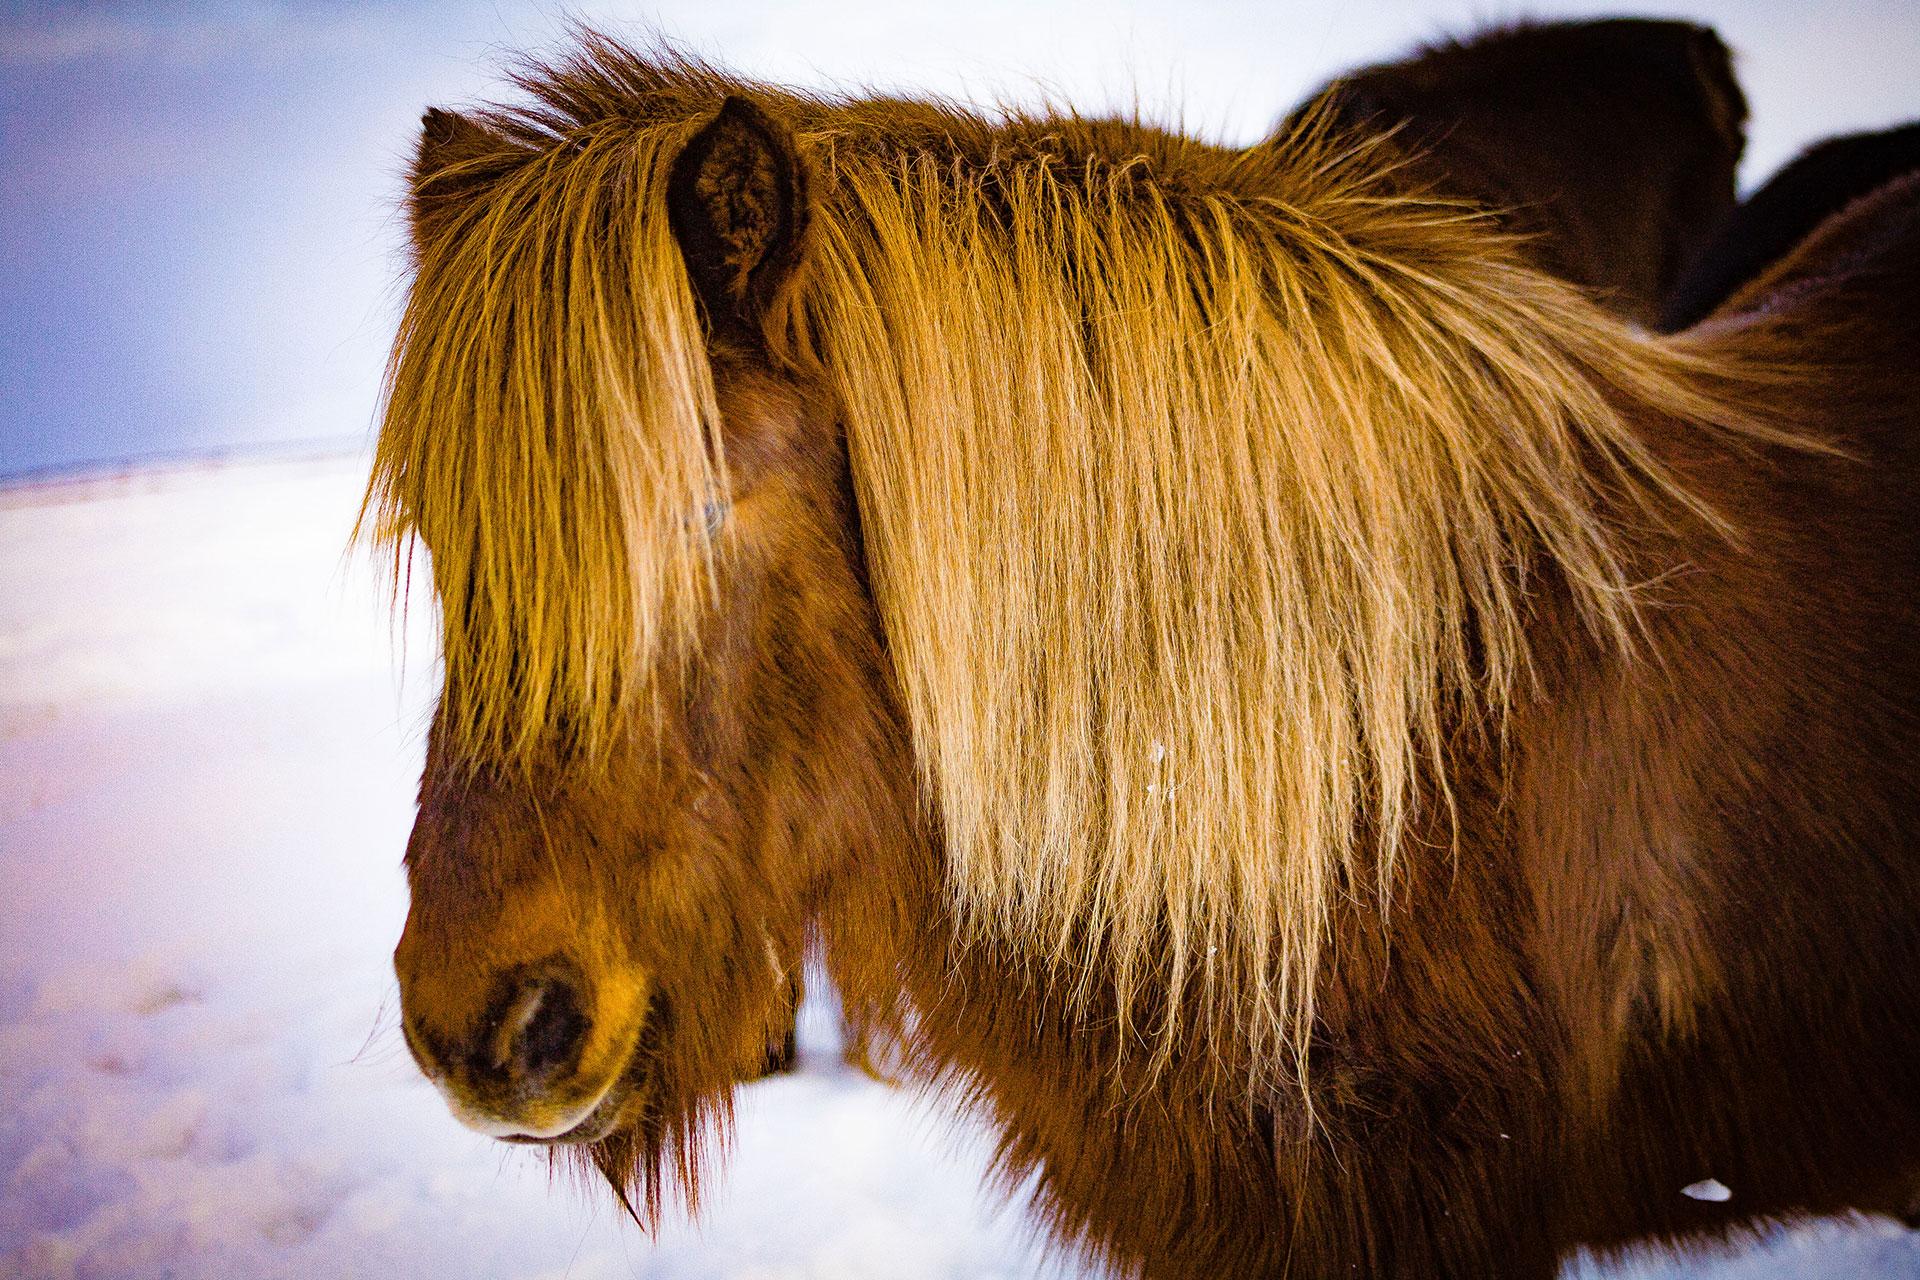 Kuce Islandzkie - fot. Piotr Kopaniszyn